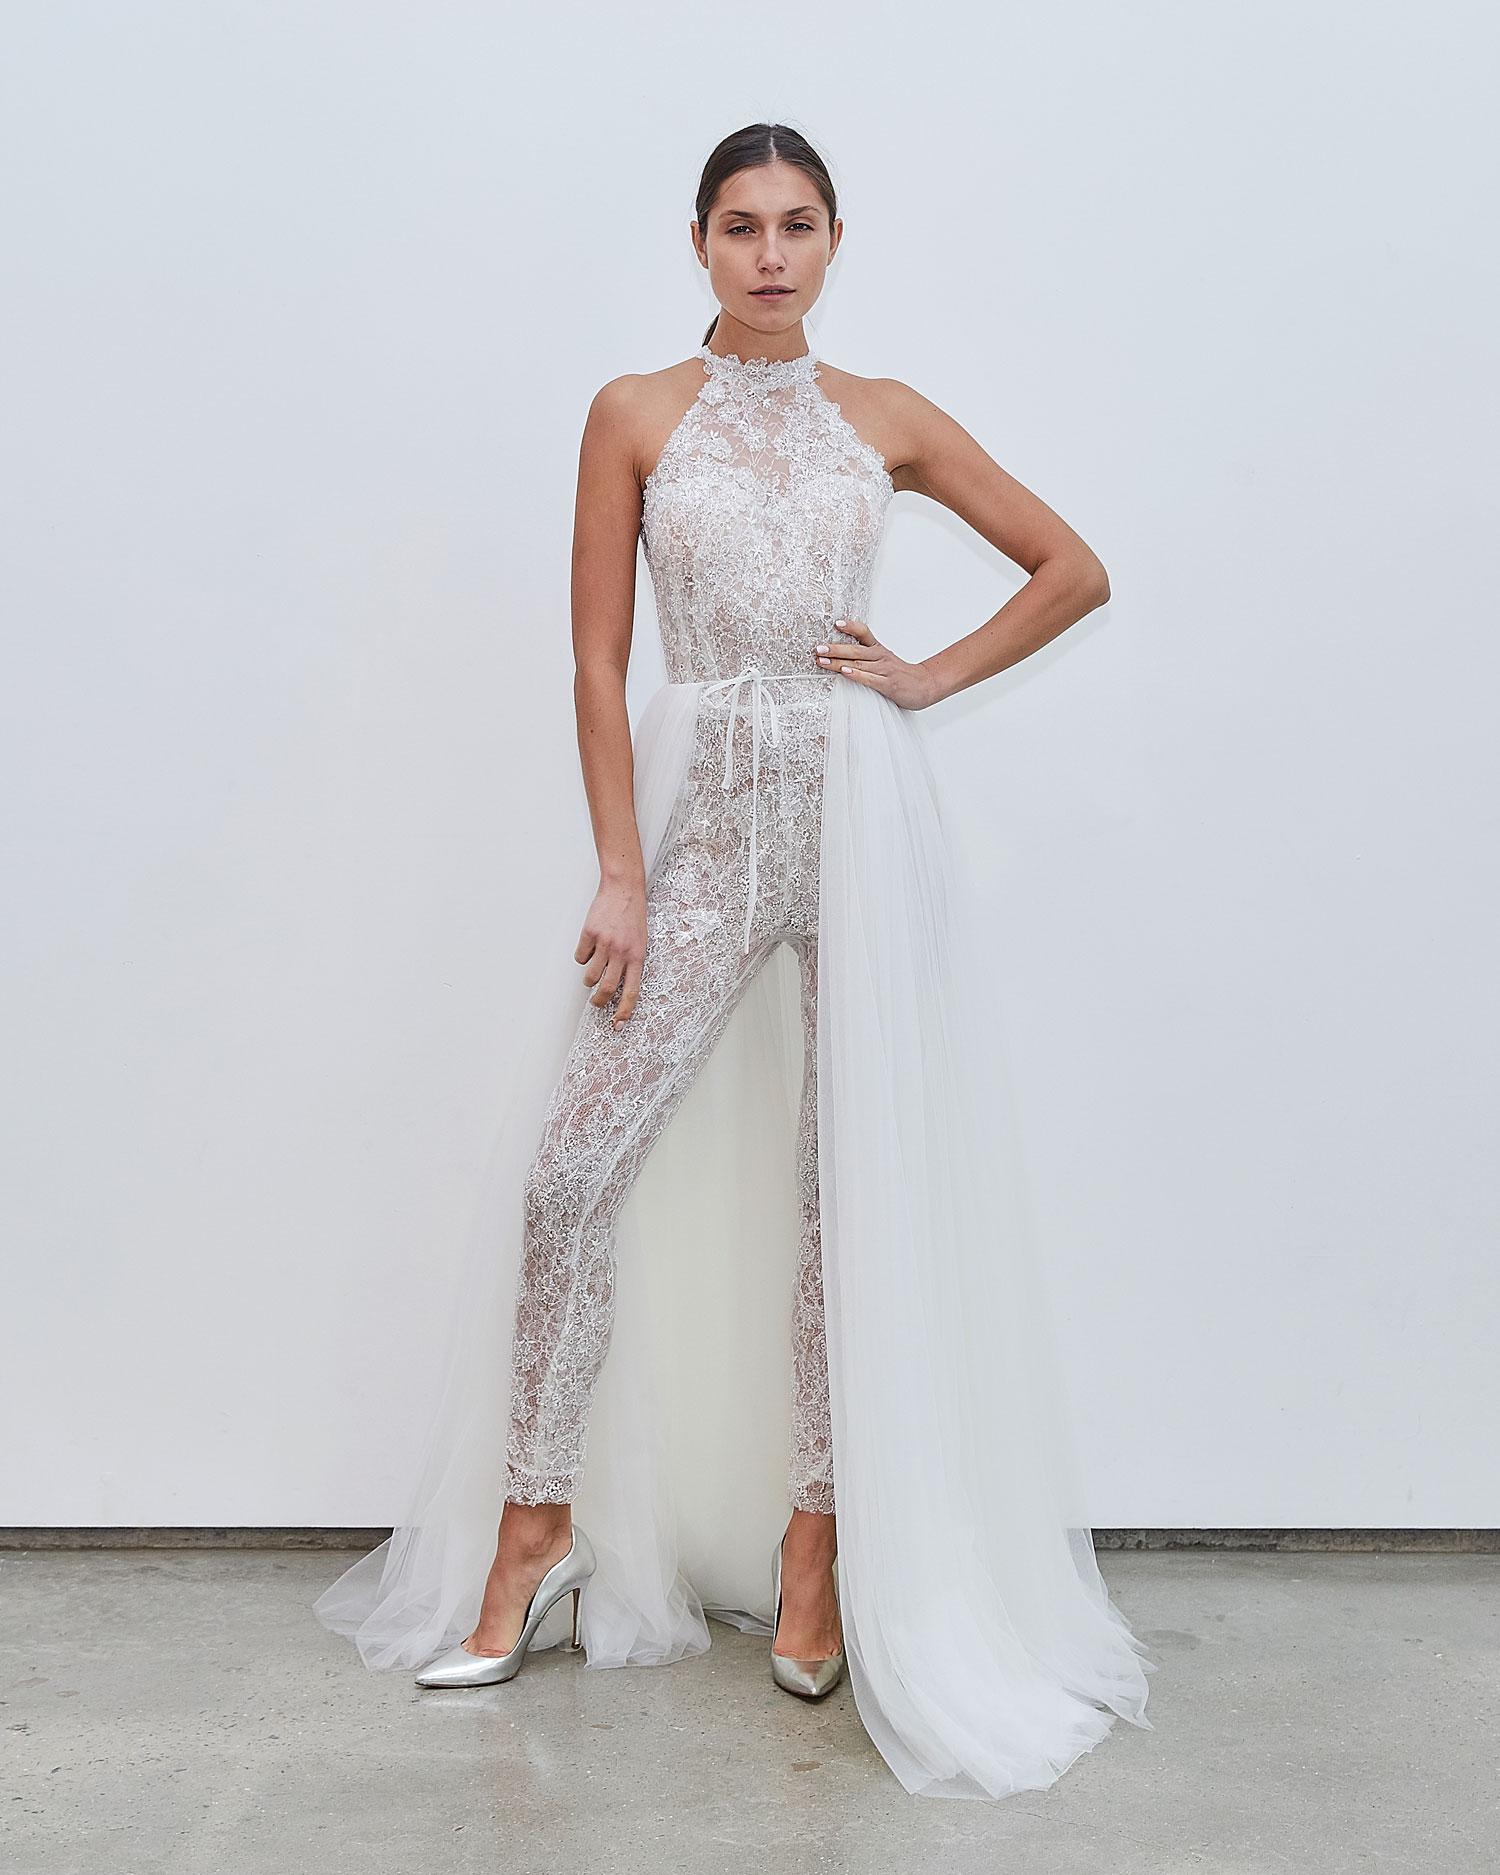 Francesca Miranda Fall 2020 bridal collection Jo wedding dress jumpsuit with overskirt halter neckline